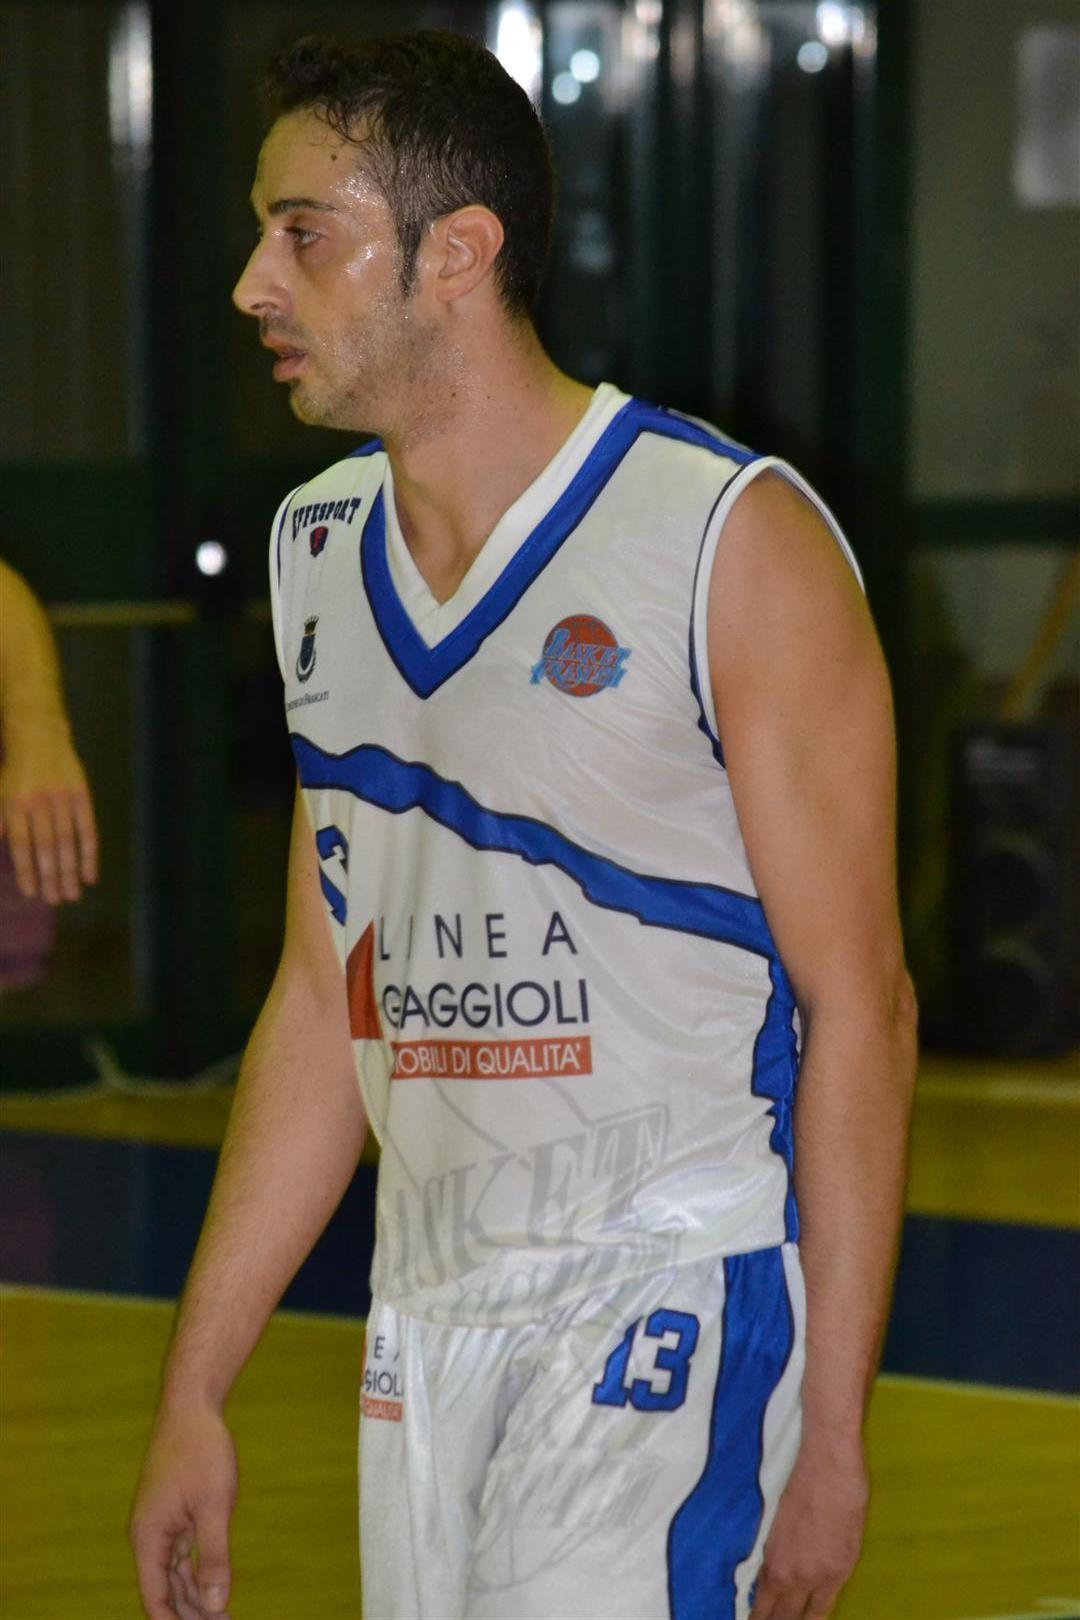 Andrea Moscianese